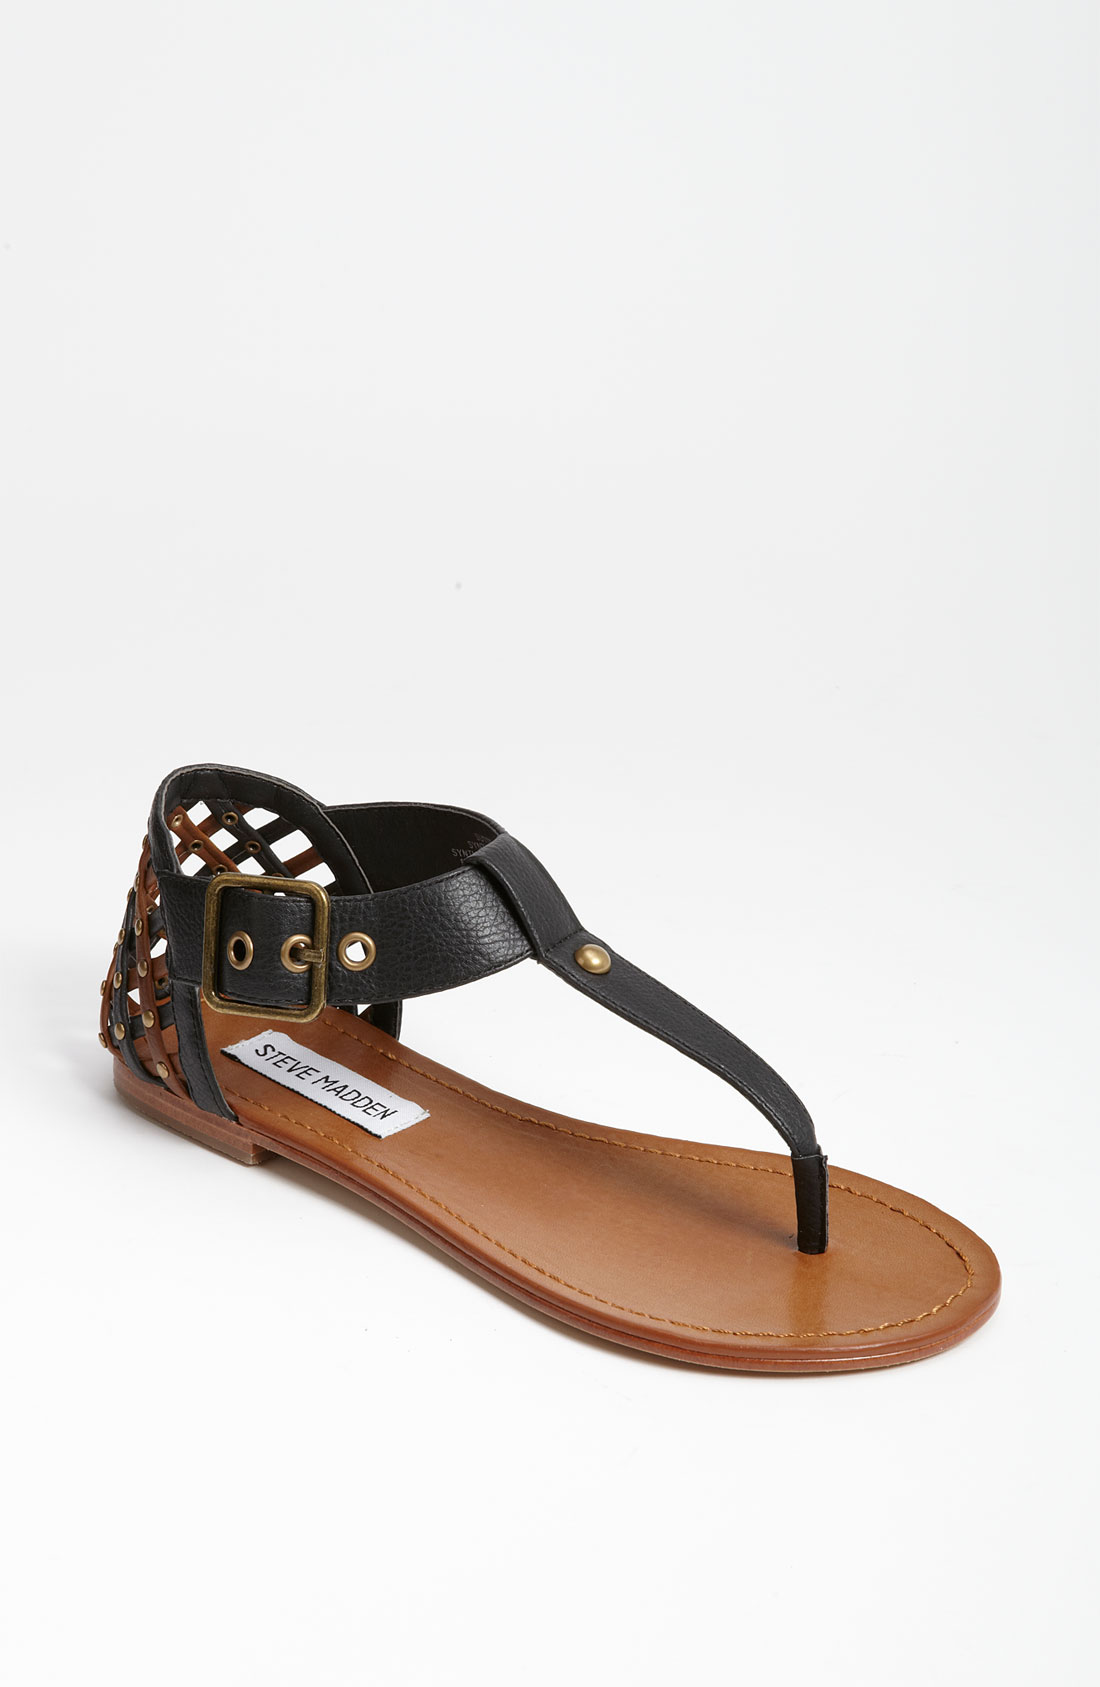 Agaci Shoes Review